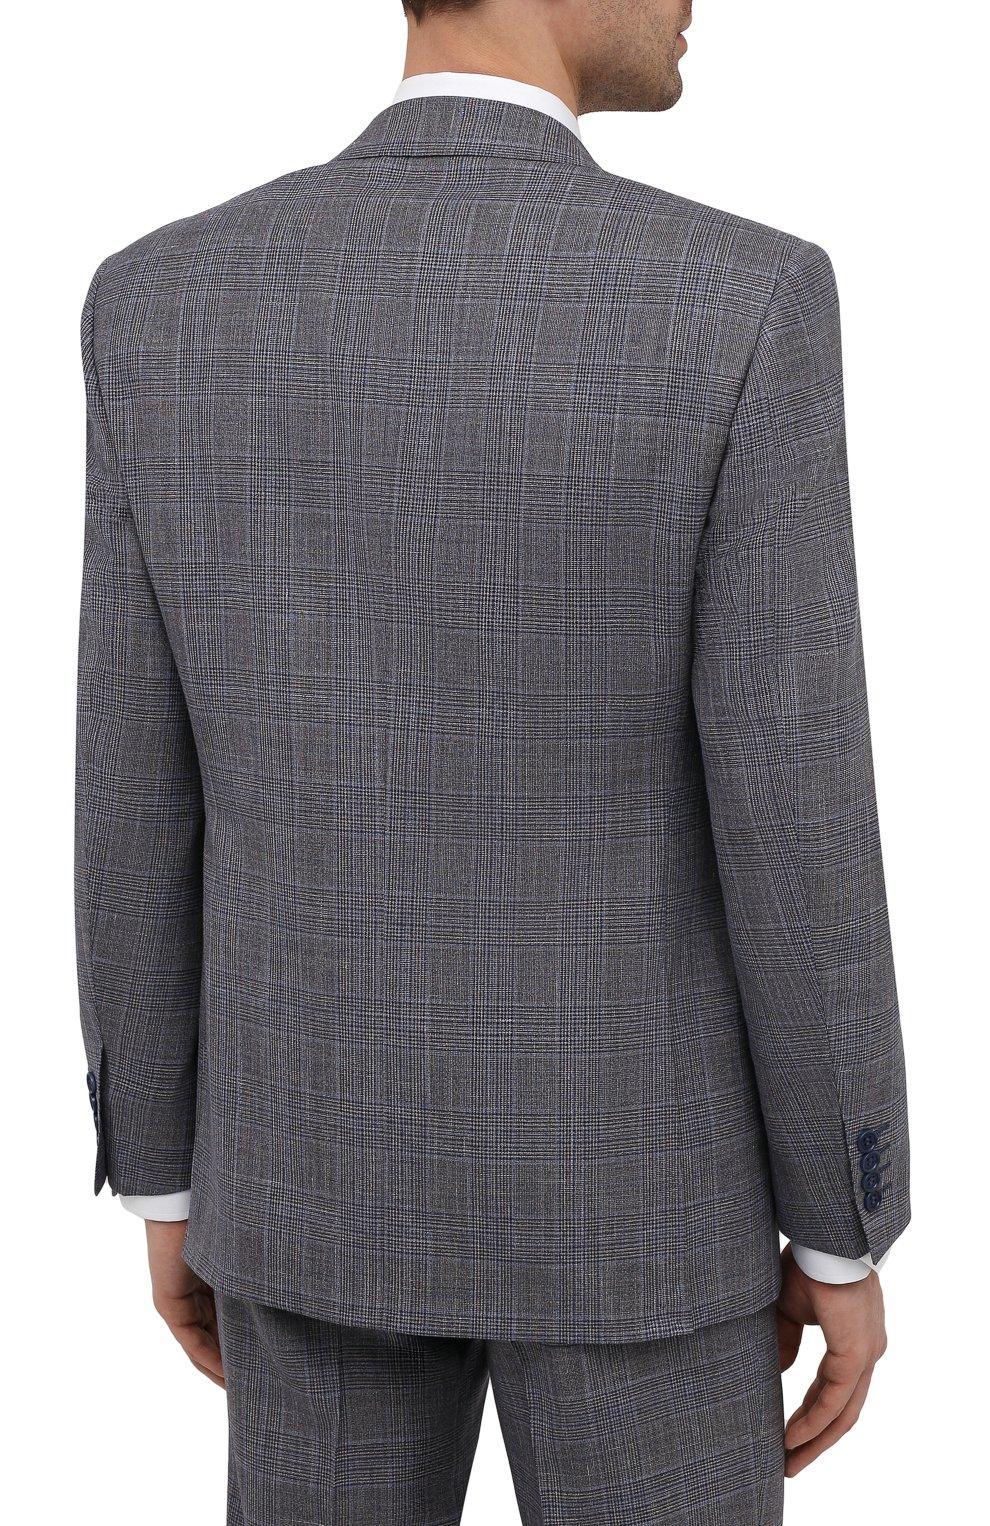 Мужской костюм из шерсти и шелка CANALI темно-серого цвета, арт. 13290/31/BF01052   Фото 3